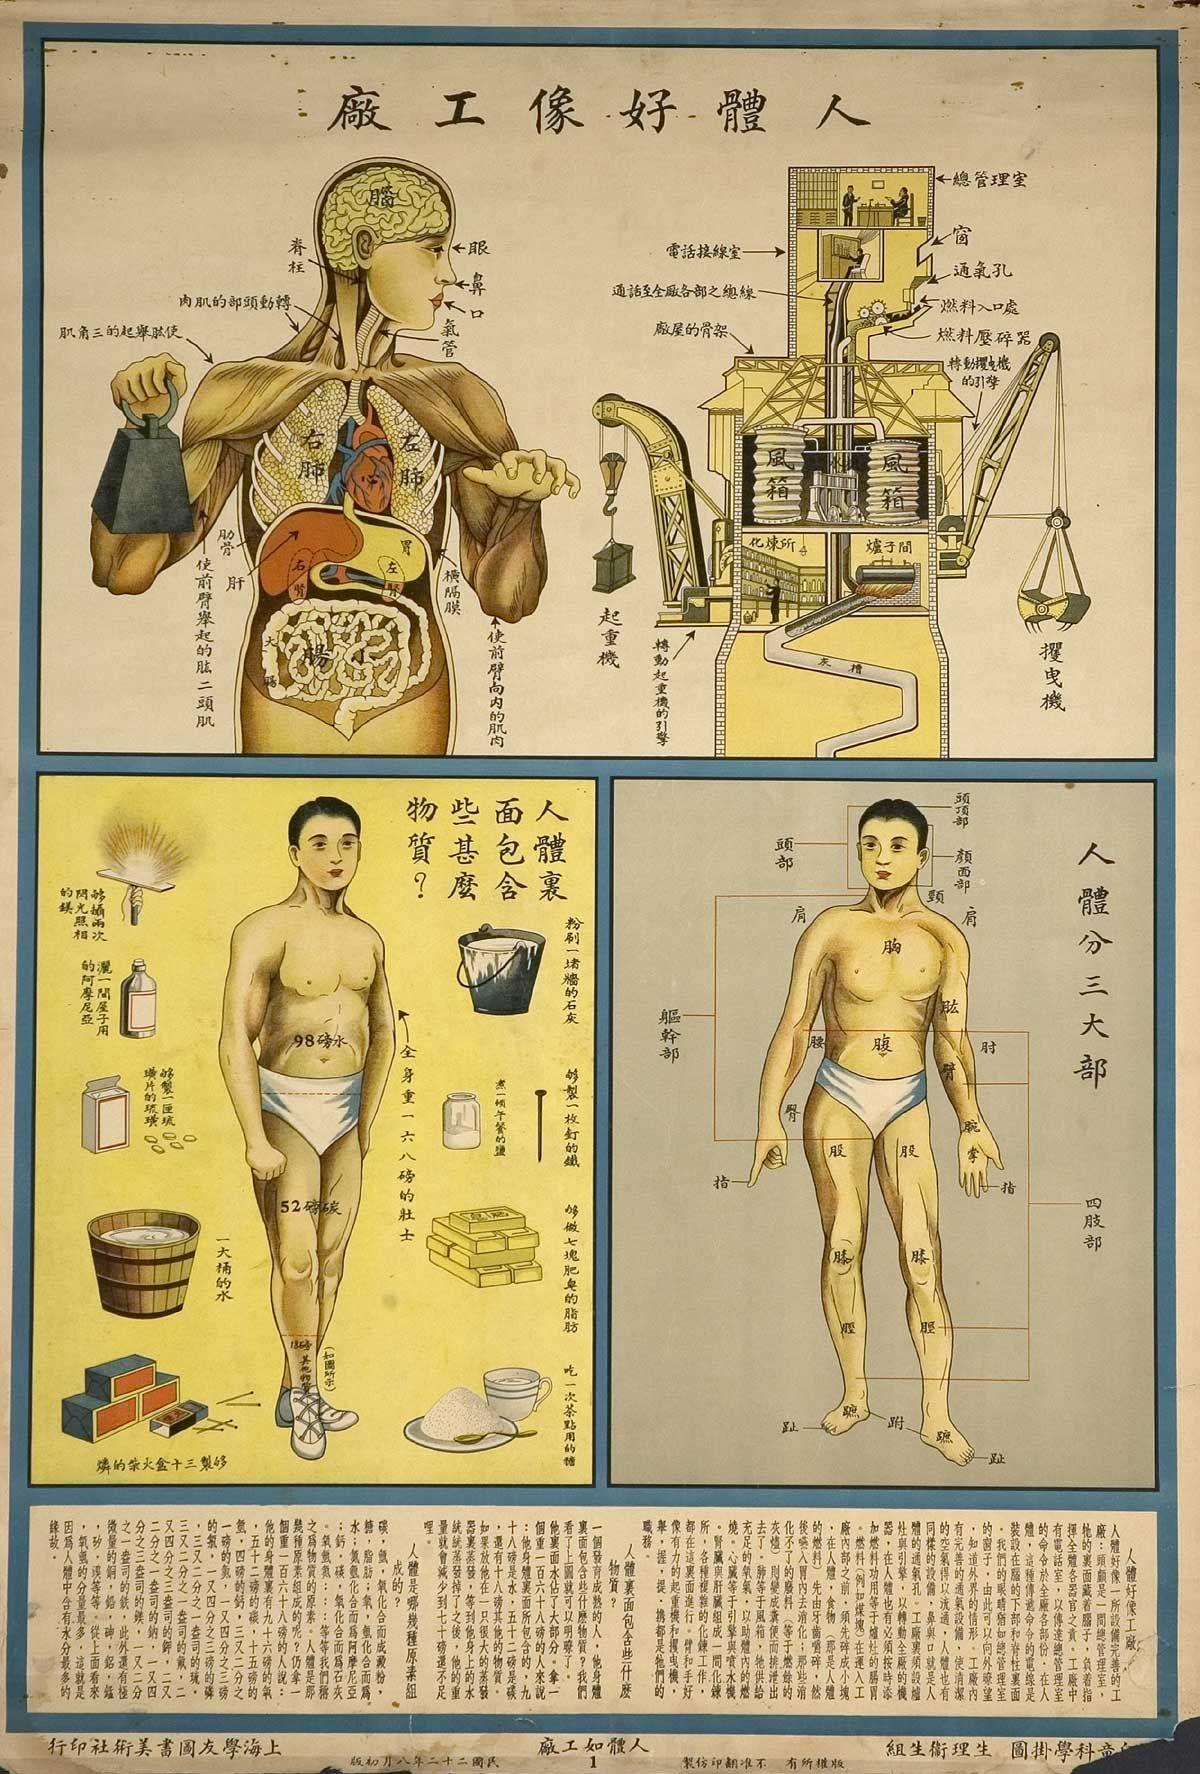 anatomy poster - Google Search   graphic & -   Pinterest   Anatomy